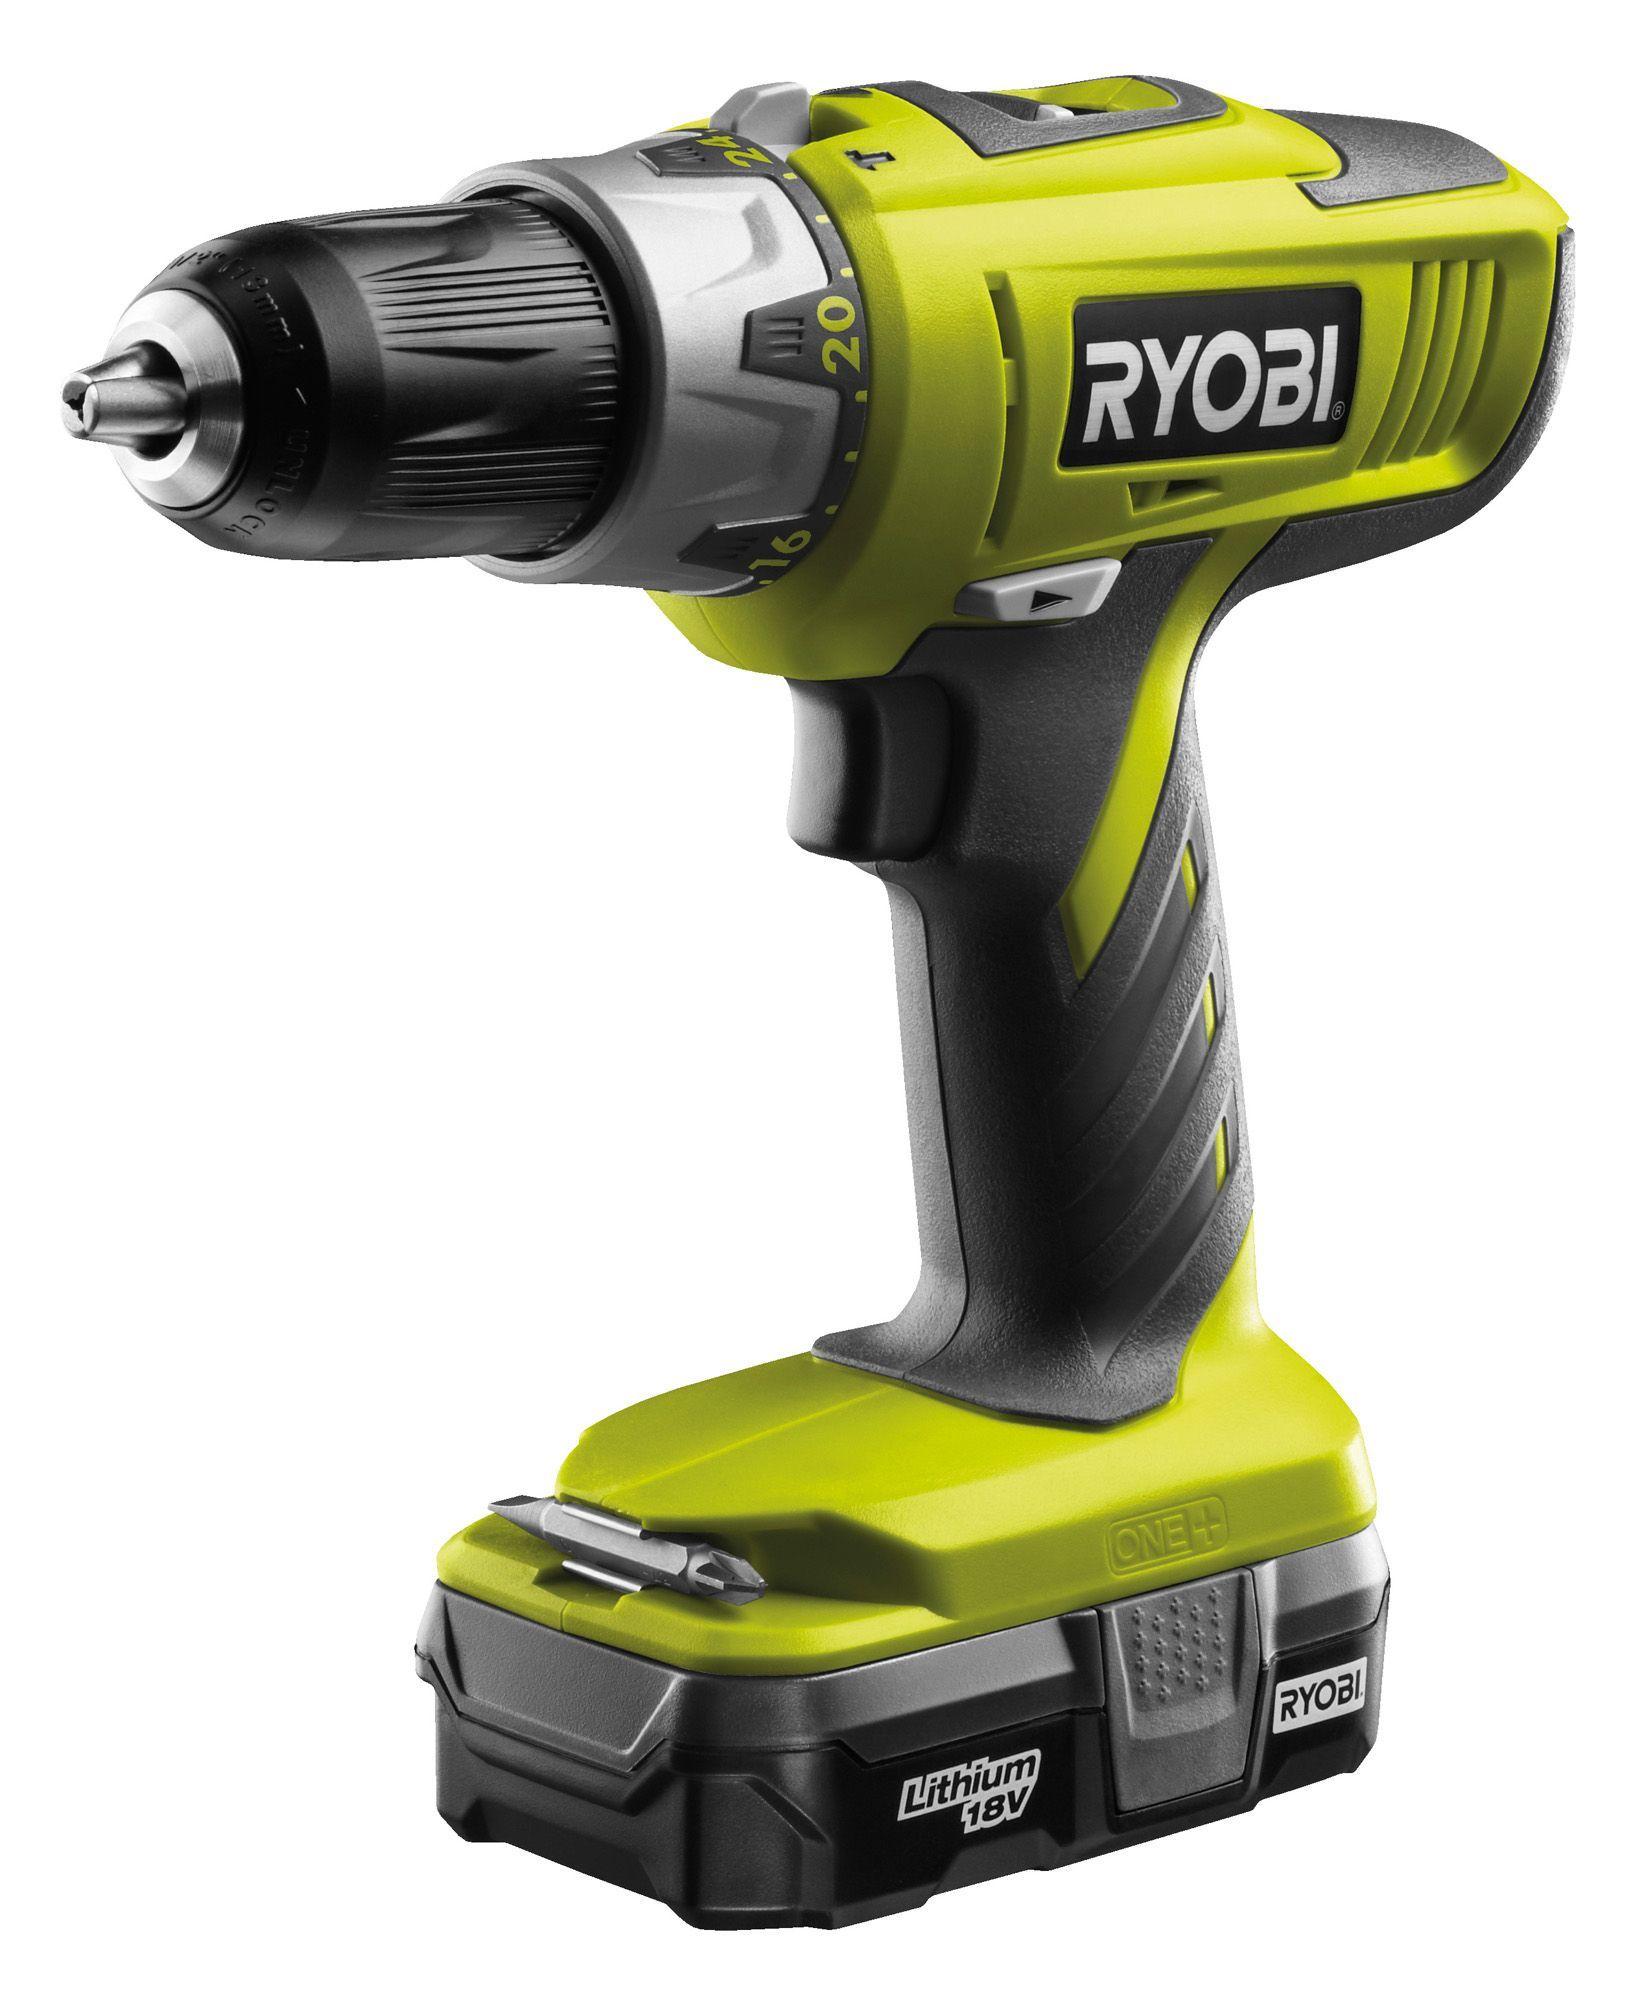 ryobi cordless 18v li ion hammer drill 1 battery llcdi1802. Black Bedroom Furniture Sets. Home Design Ideas